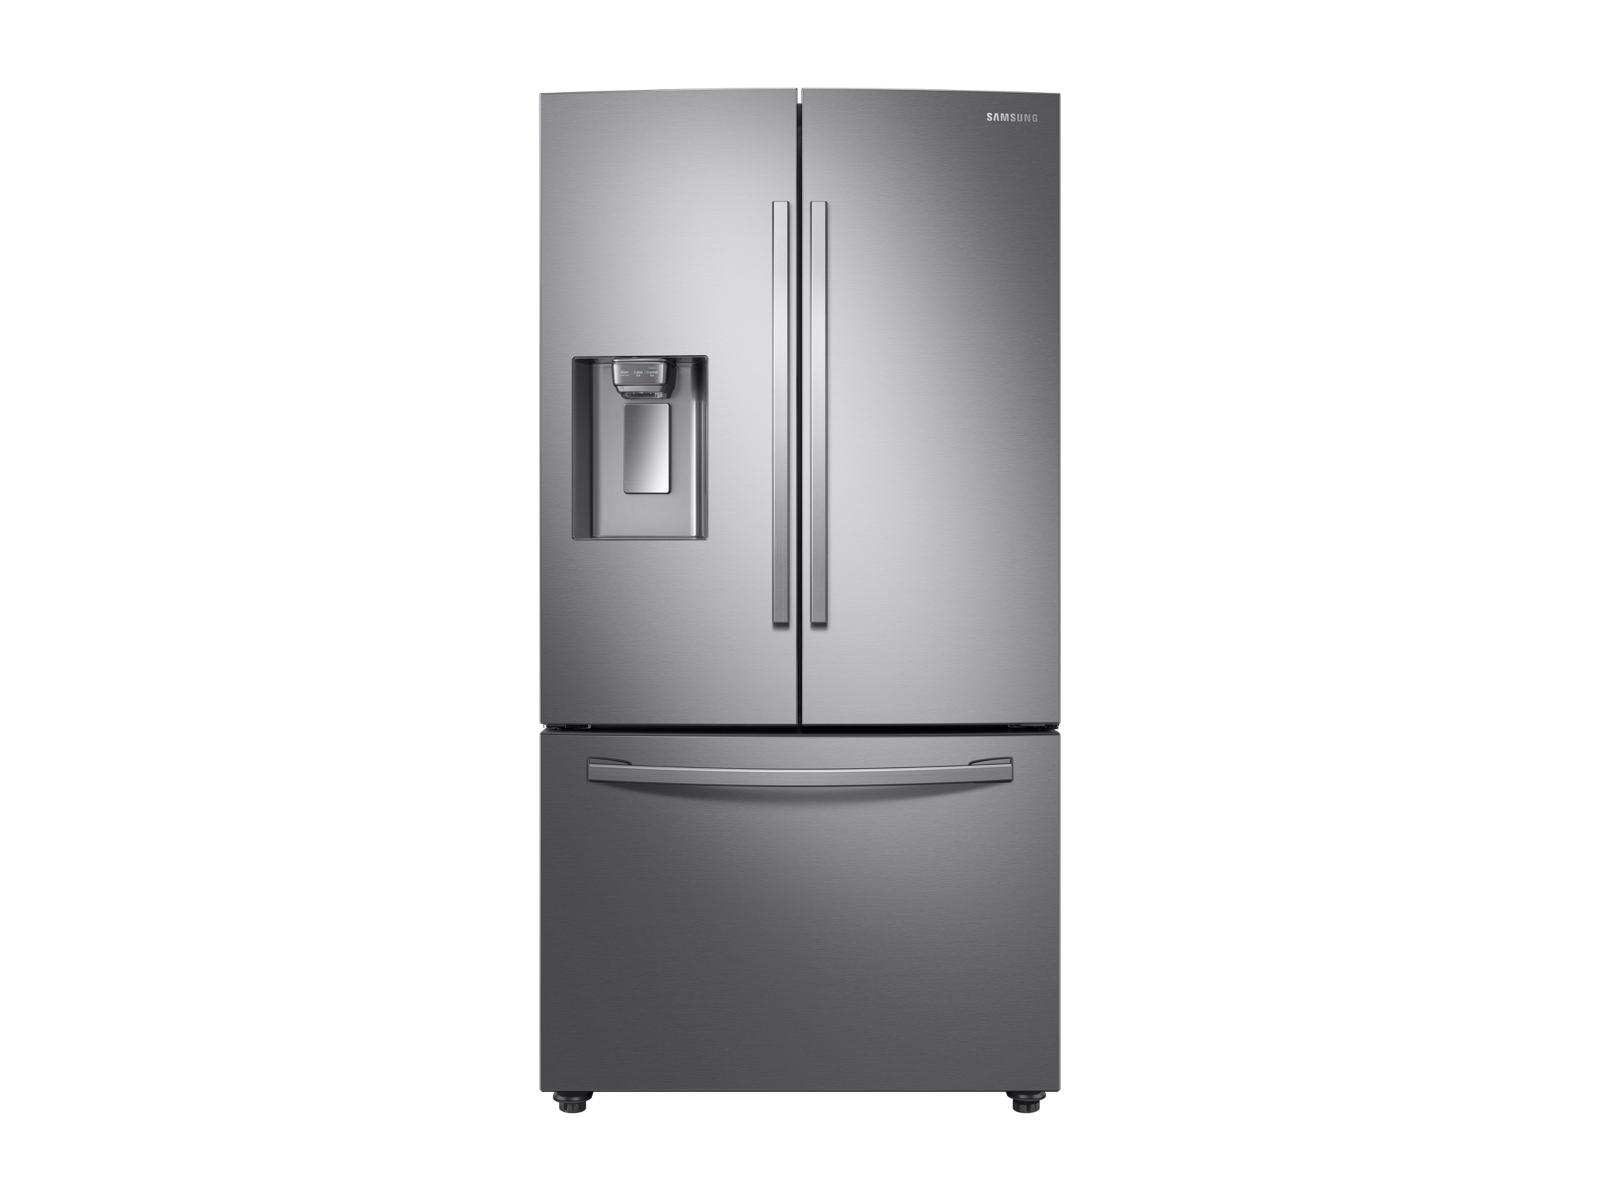 Large Capacity 3-door Refrigerator + Gas Range + StormWash Dishwasher + Microwave Kitchen Package in Stainless Steel